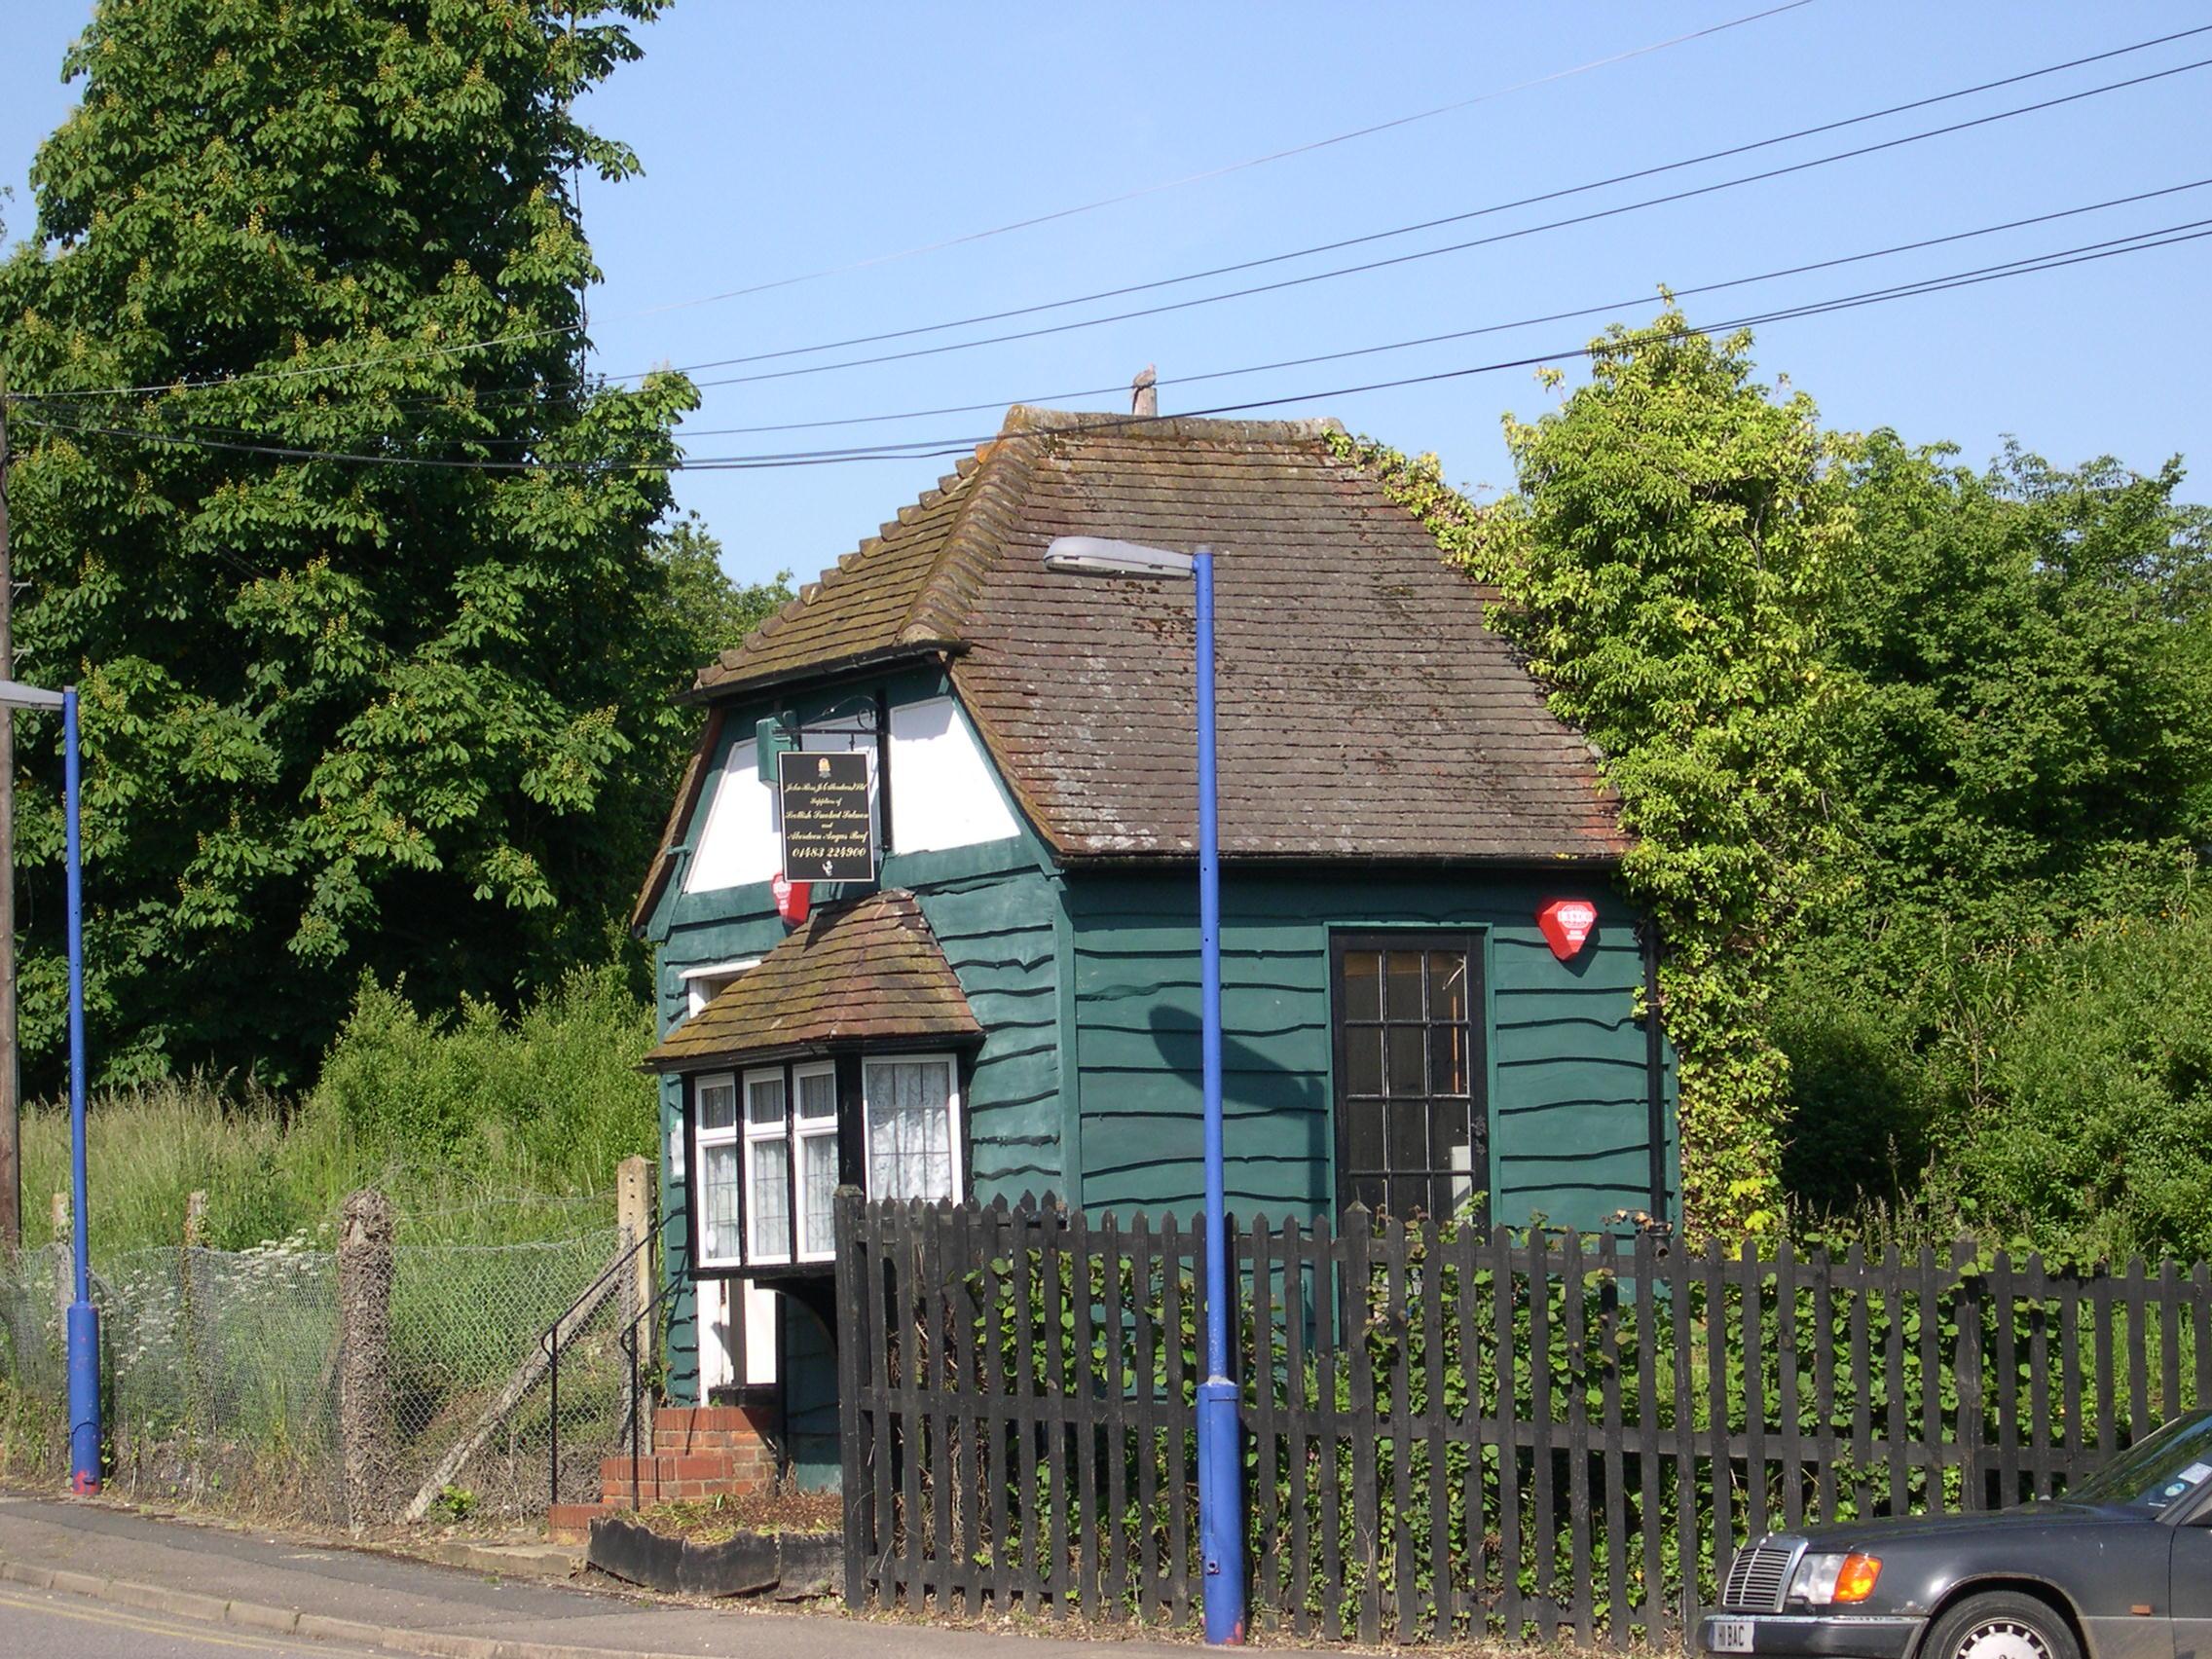 Strange building next to train station in E. Clandon.